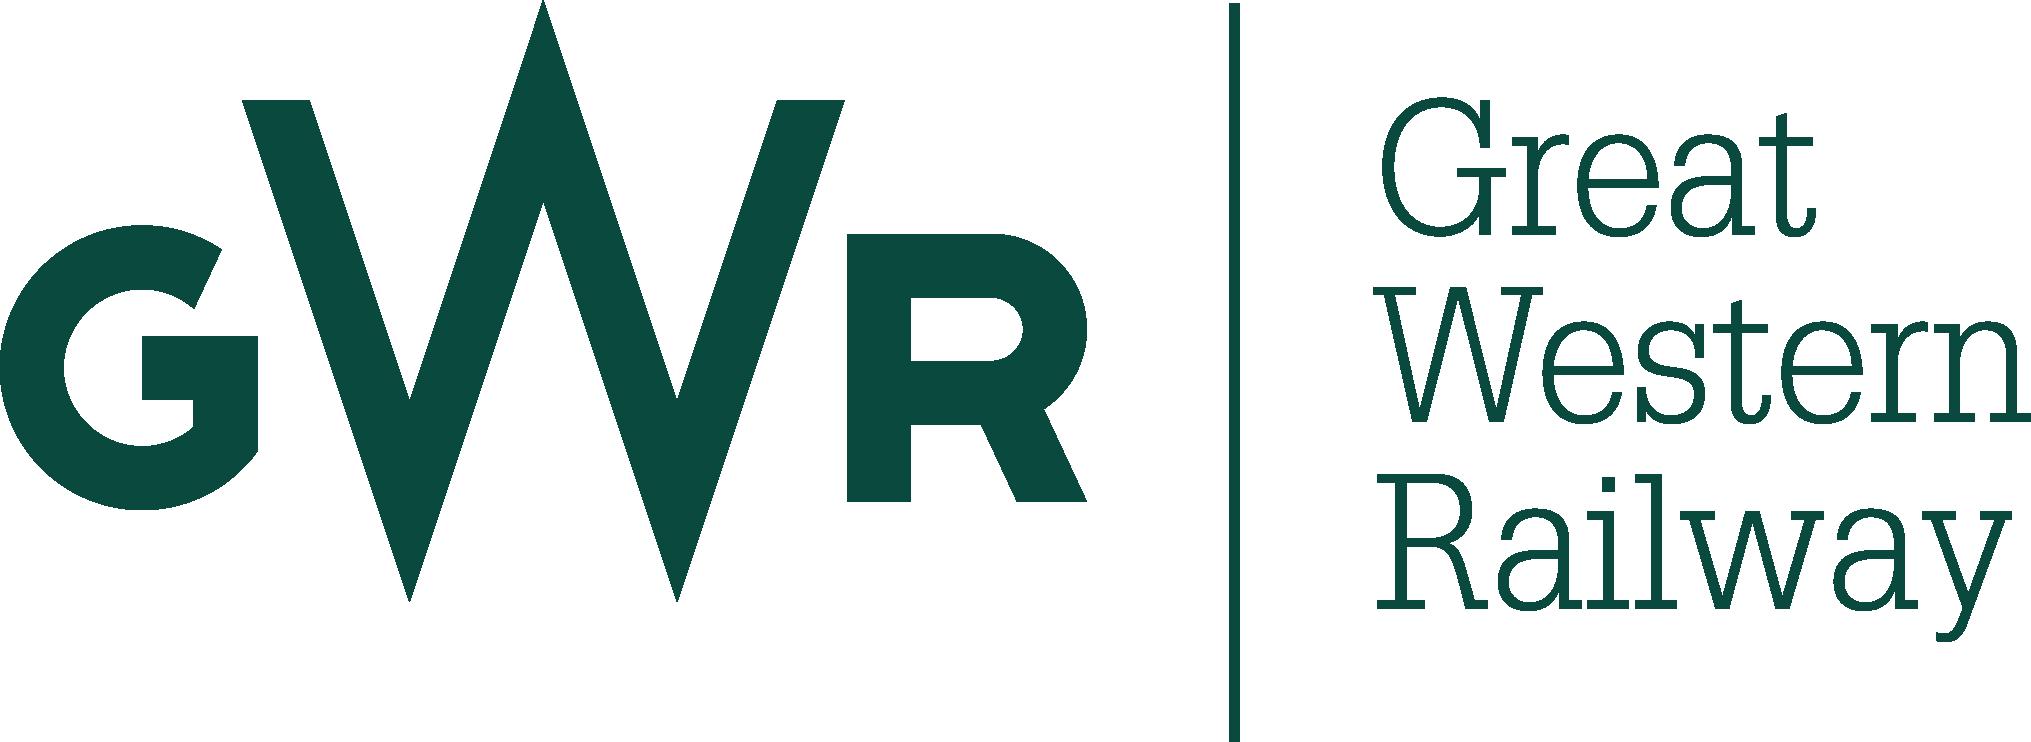 Great Western Railway's green logo